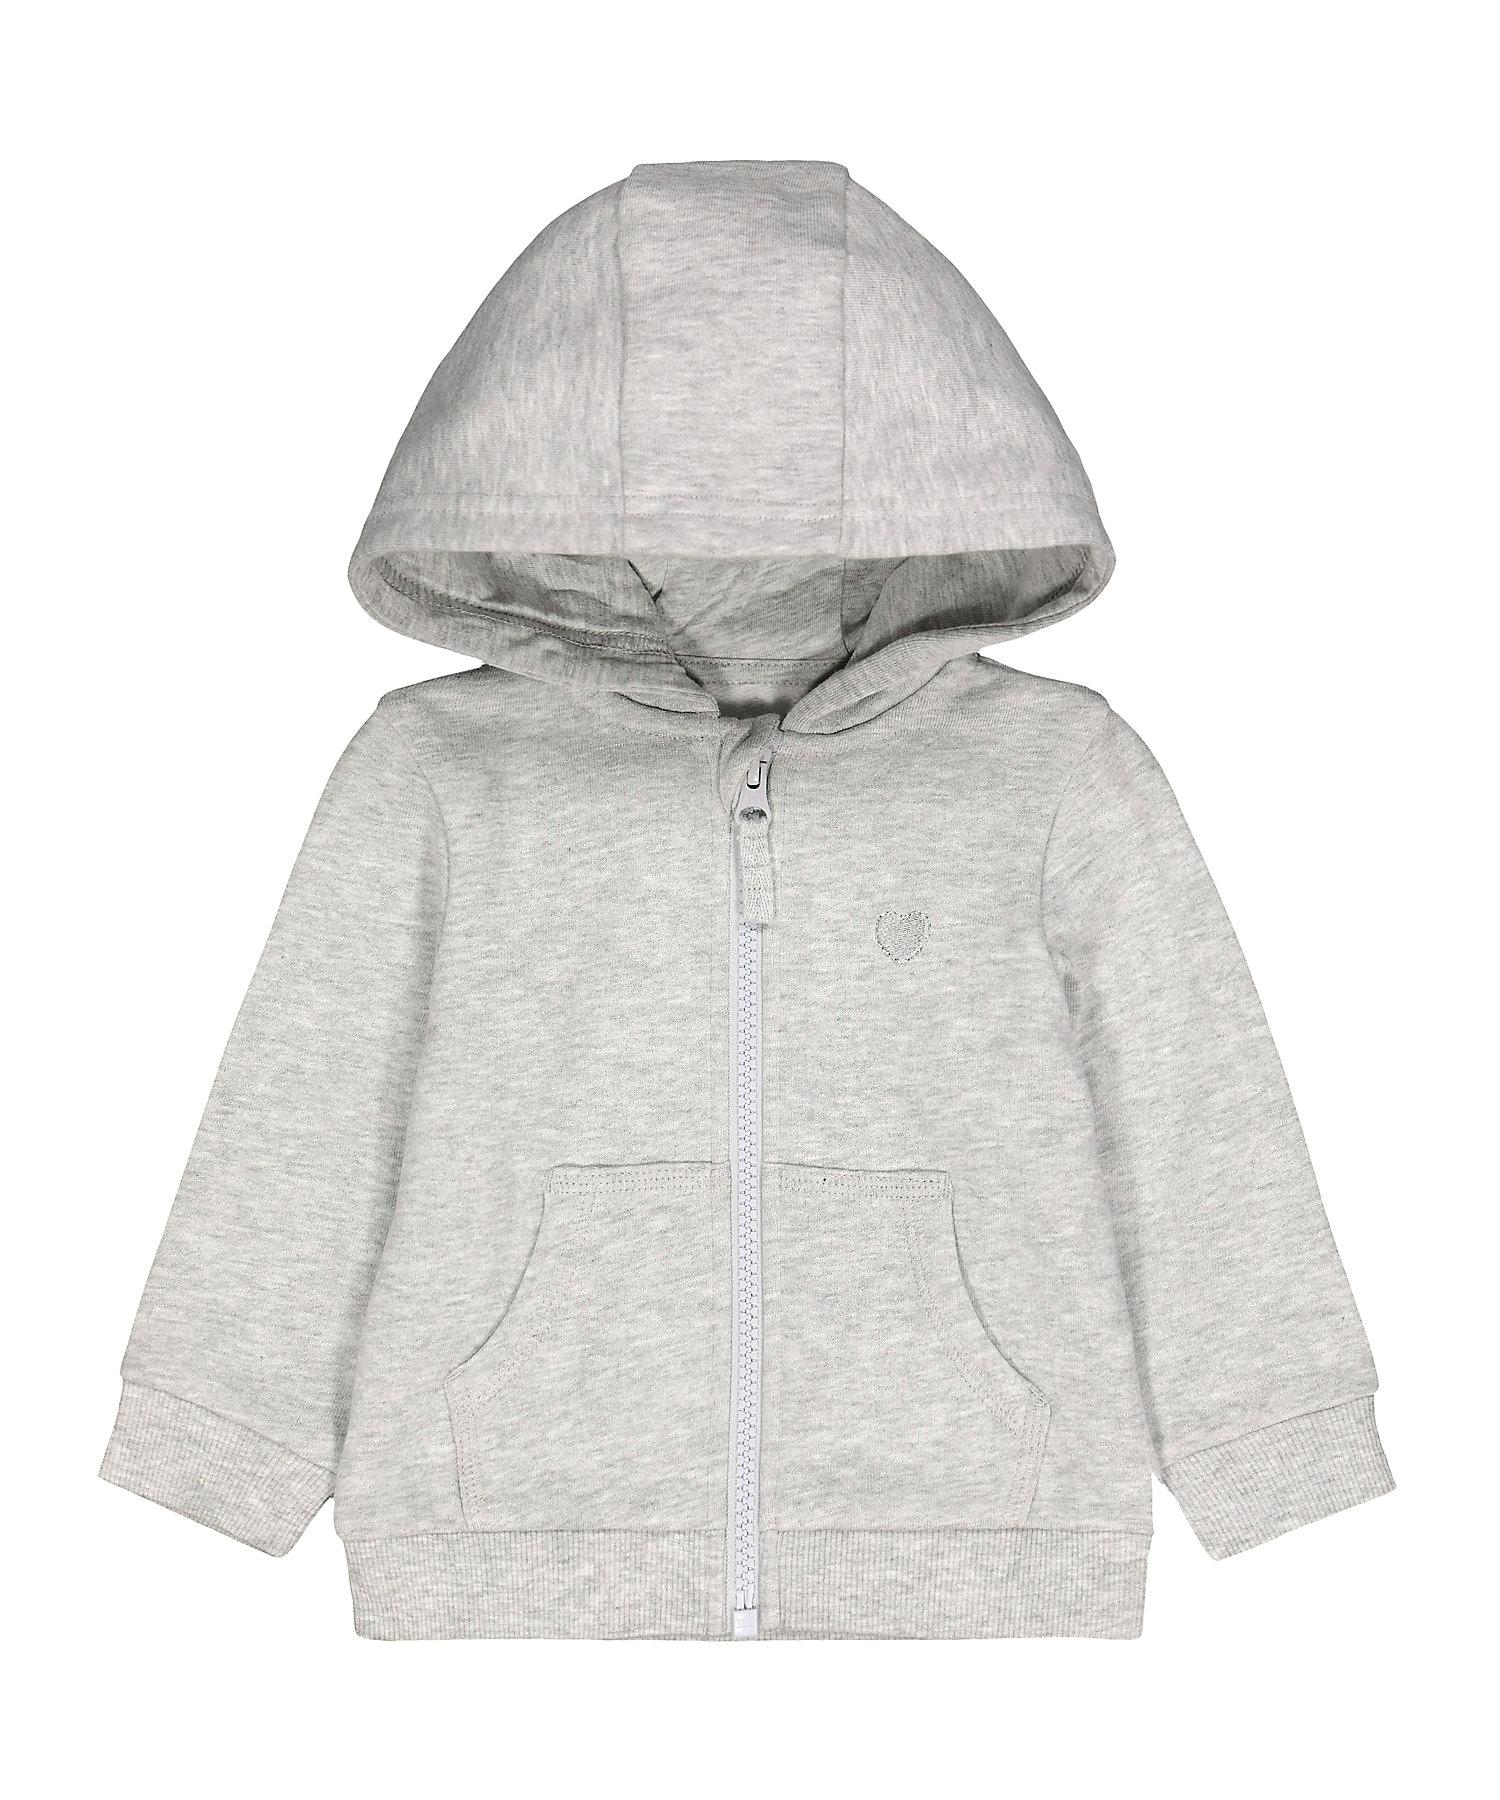 Mothercare | Girls Full Sleeves Hooded Sweatshirt Zip Opening - Grey